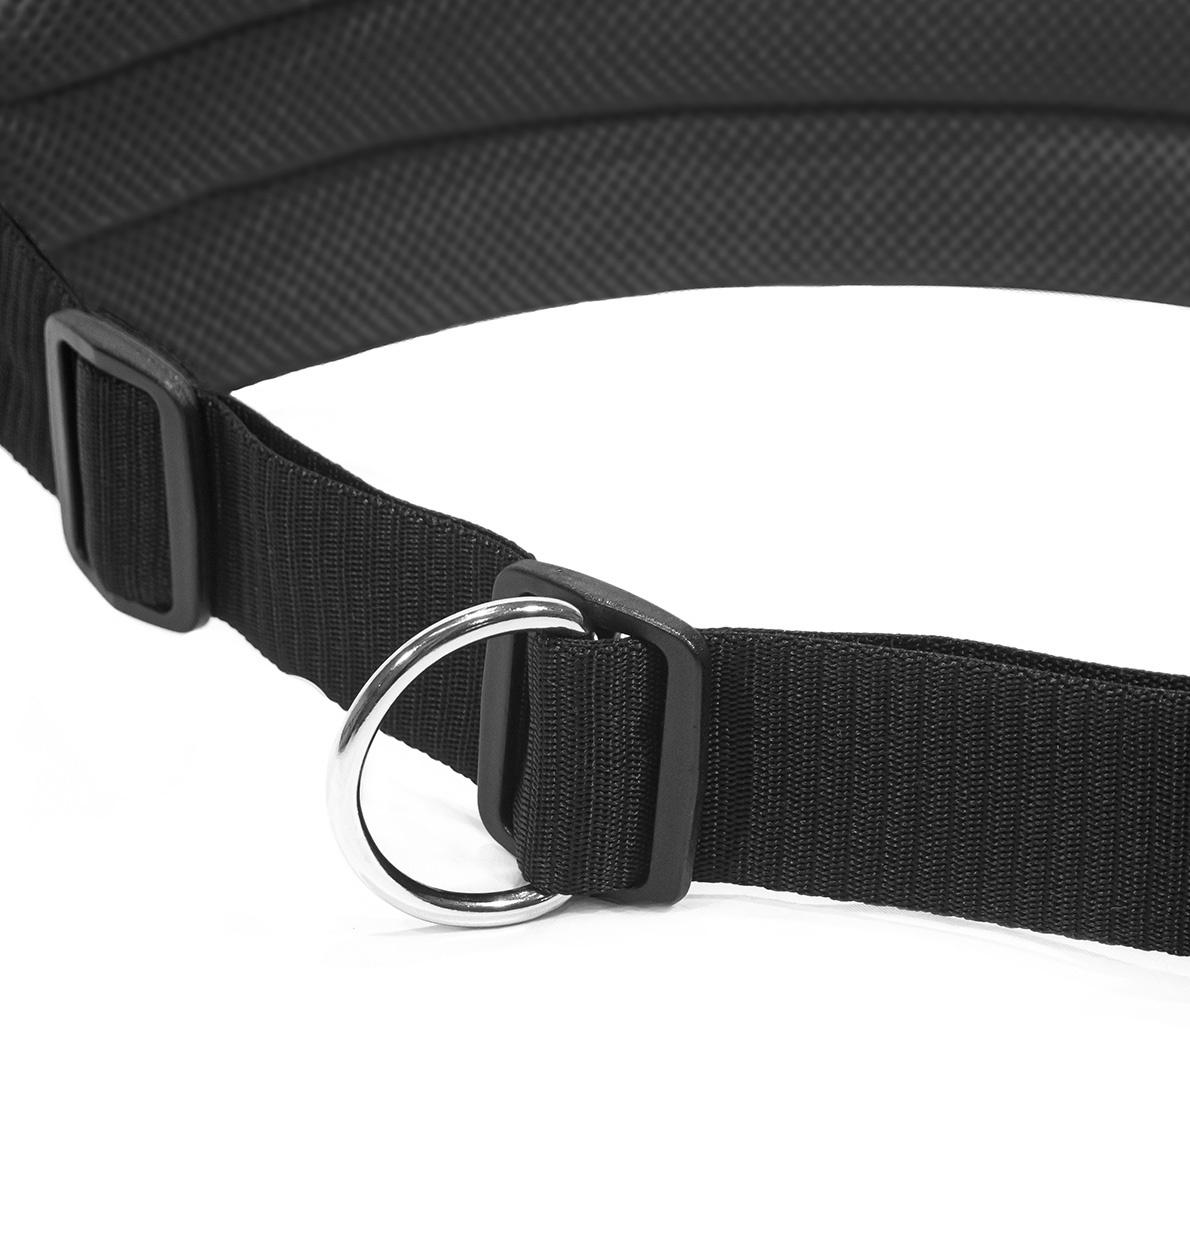 Handsfree Dog Walking Running Jogging Waist Belt -  black Pedding/ black with reflectors - FBA